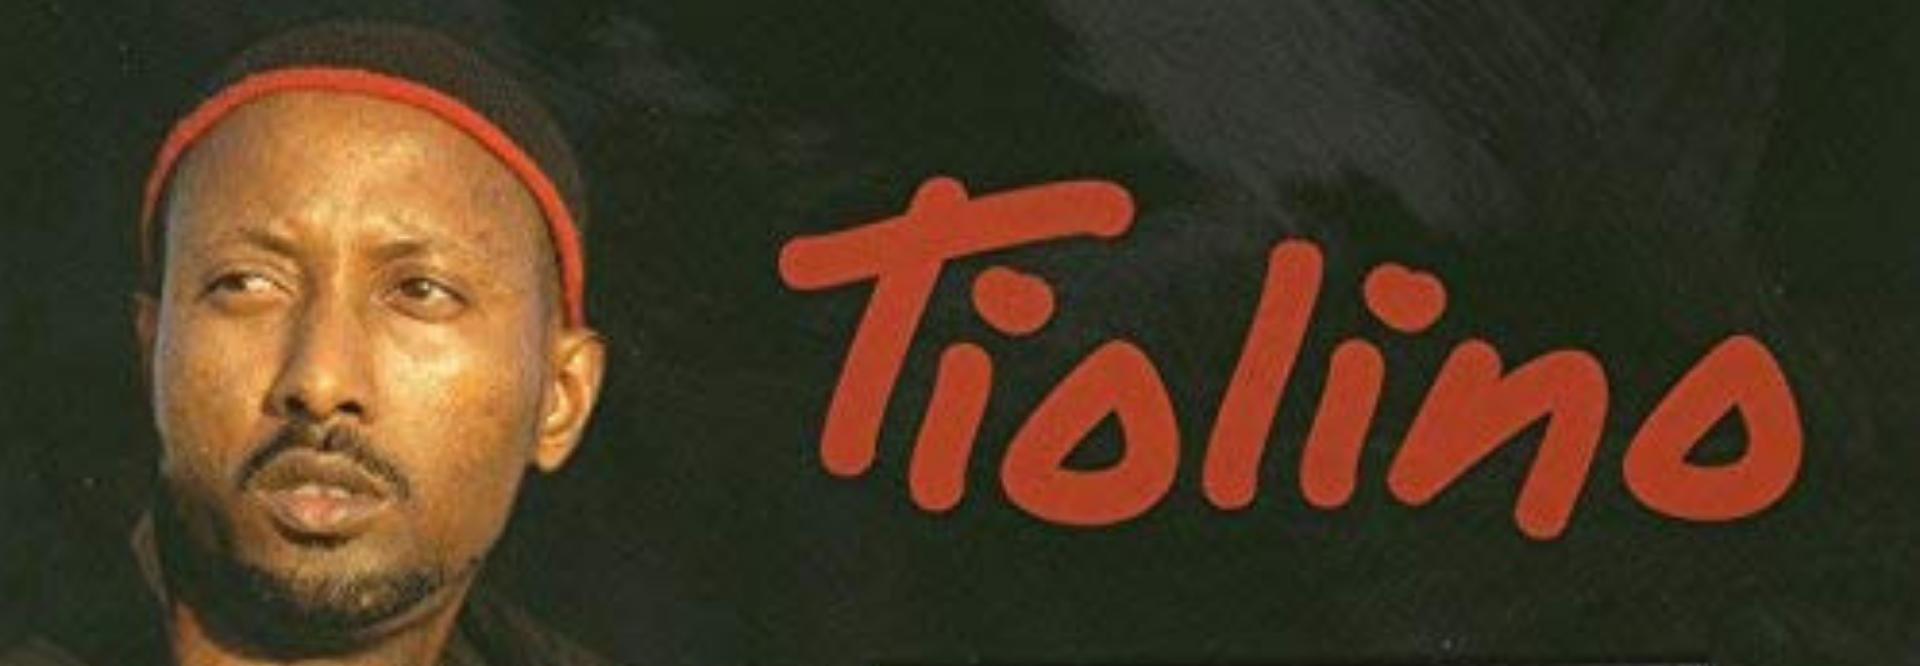 Tiolino bannière